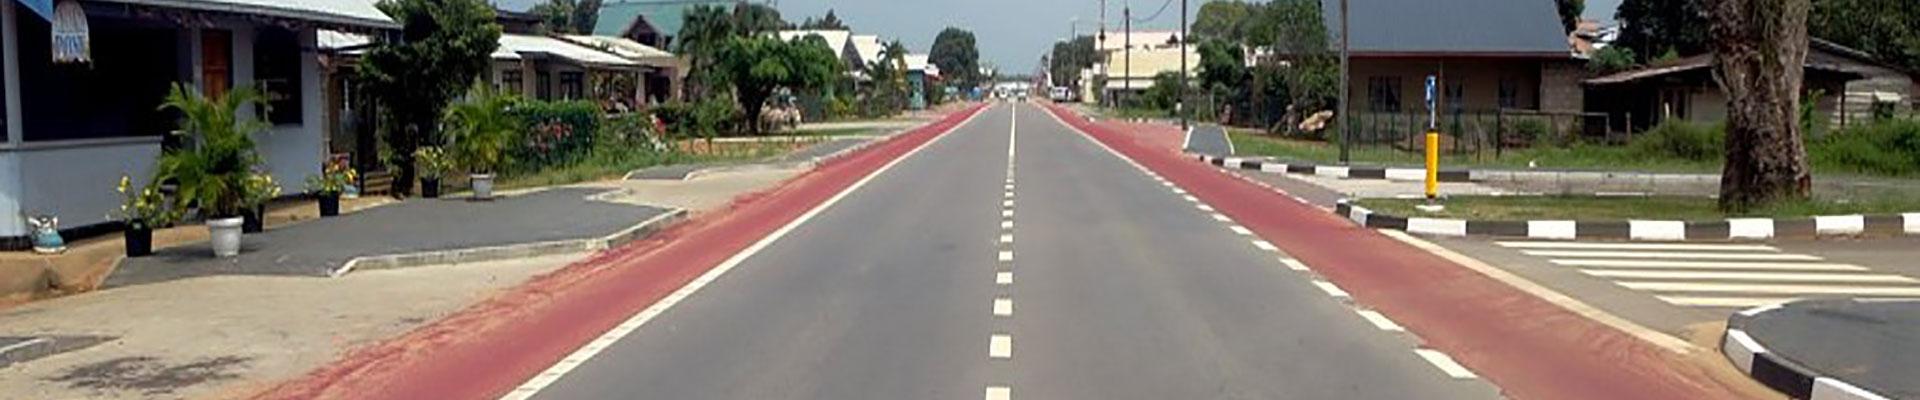 roads-design